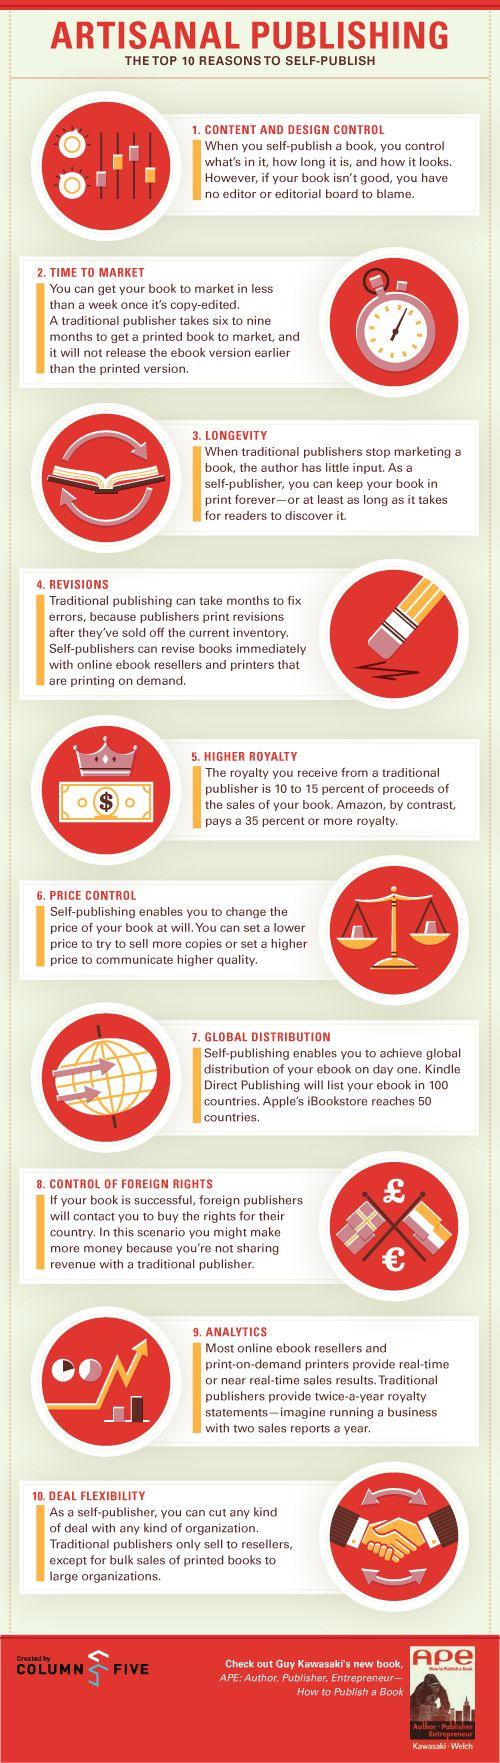 #Infographic: Artisanal Publishing - Top 10 Reasons to Self-Publish by @GuyKawasaki via @DeniseWakeman > Compelling reasons, to be sure!